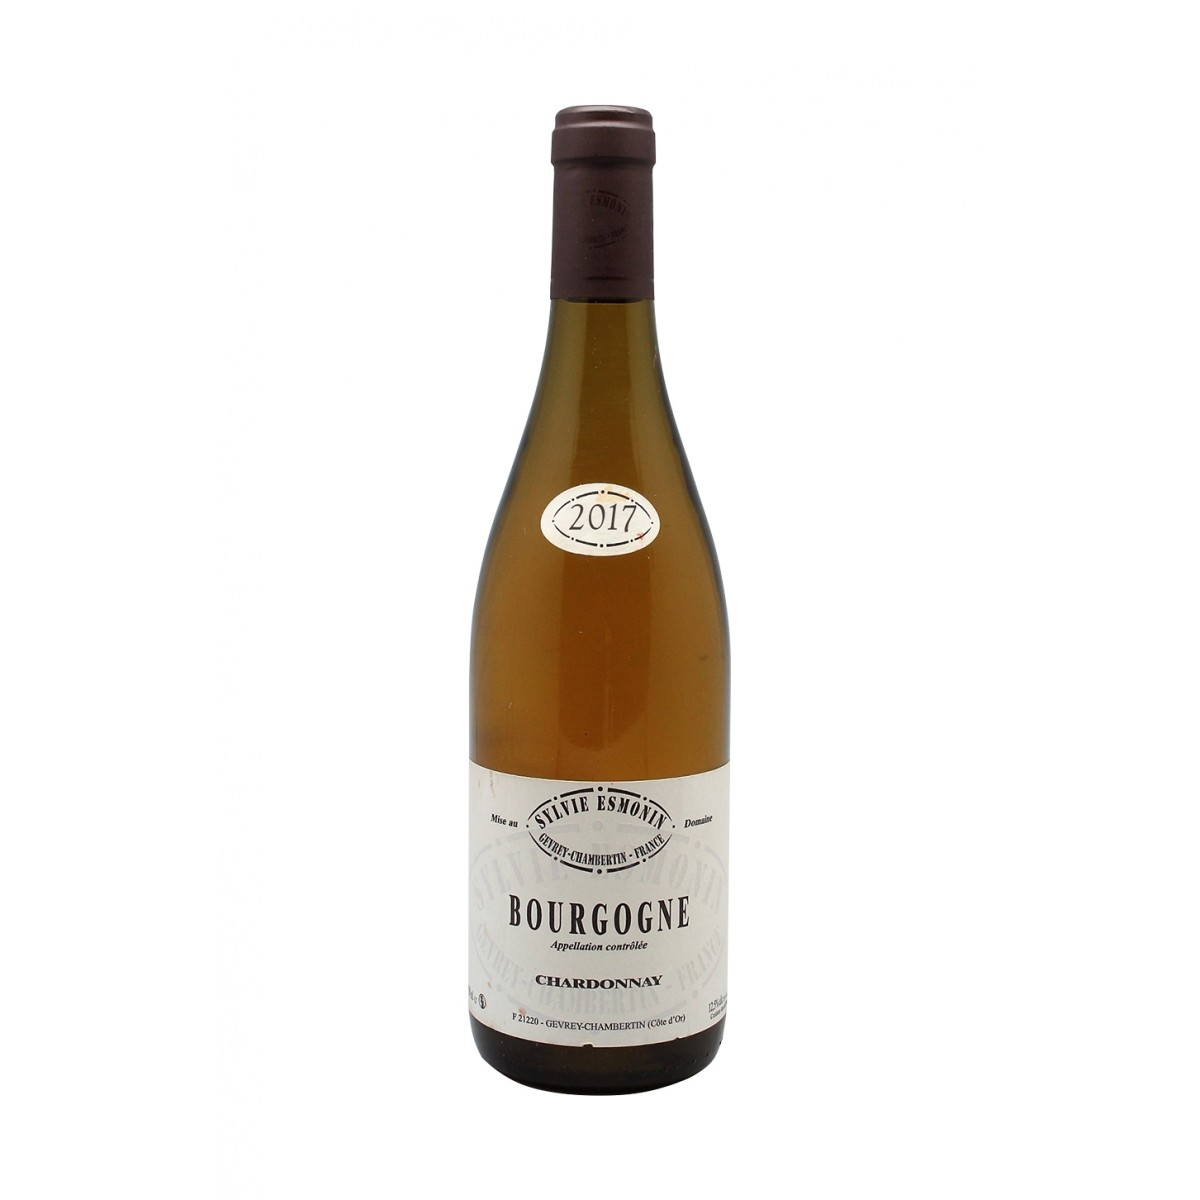 Bourgogne Blanc 2017 - Domaine Sylvie Esmonin